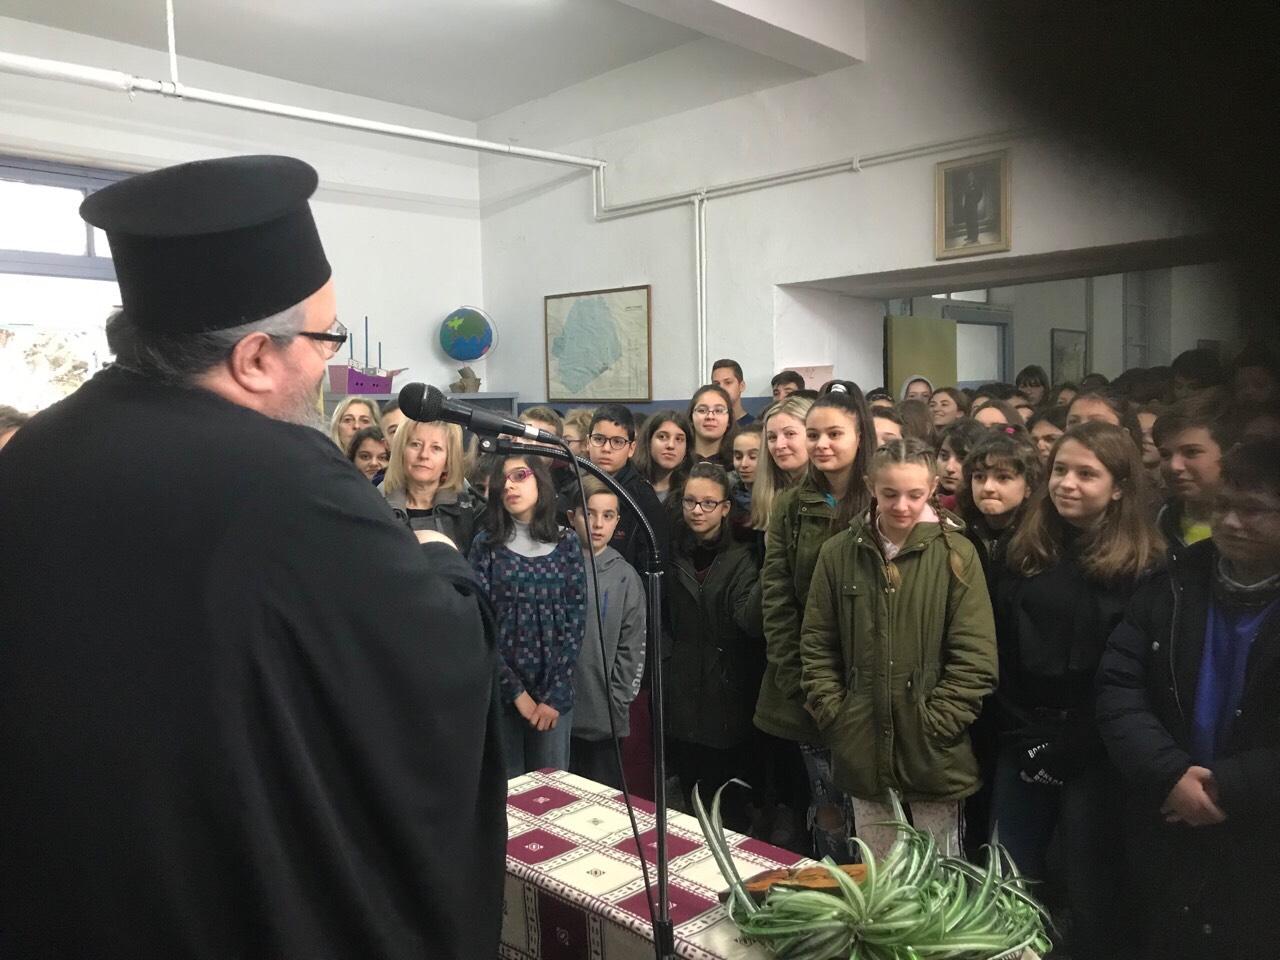 sxolia tirnavos 9 - Σε σχολεία του Τυρνάβου ο Σεβασμιώτατος (φωτ.)